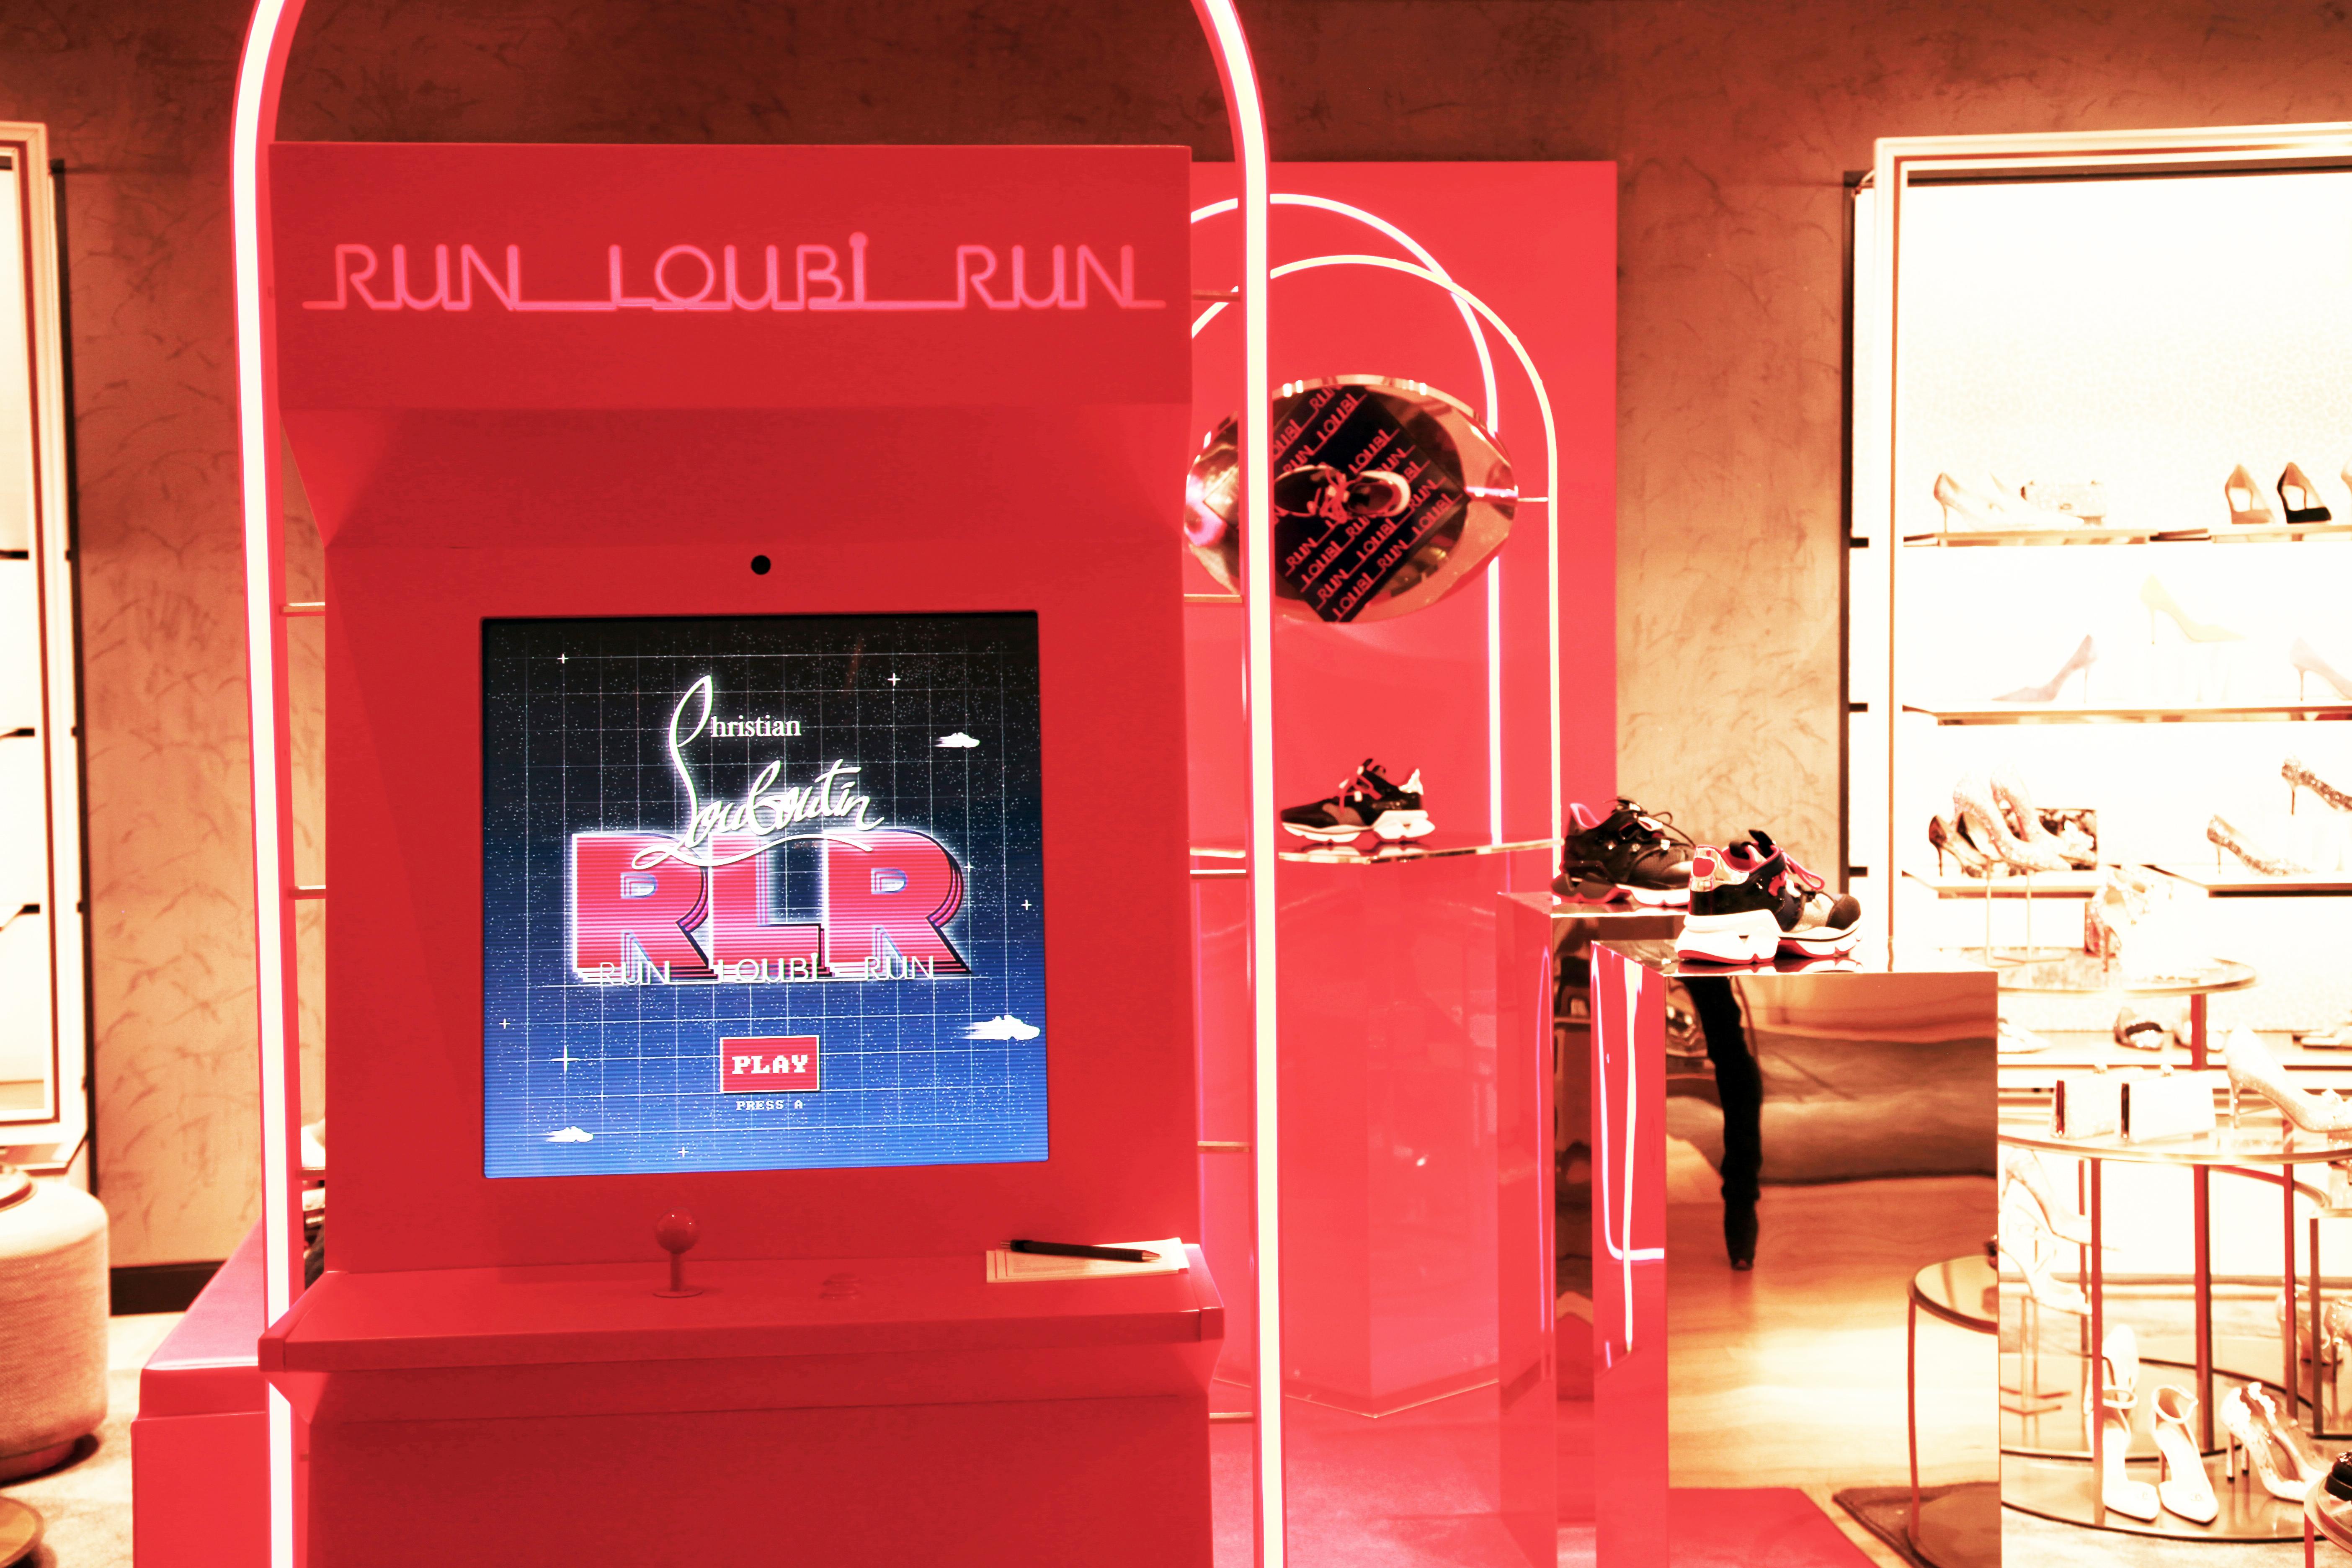 Christian Louboutin - Run Loubi Run